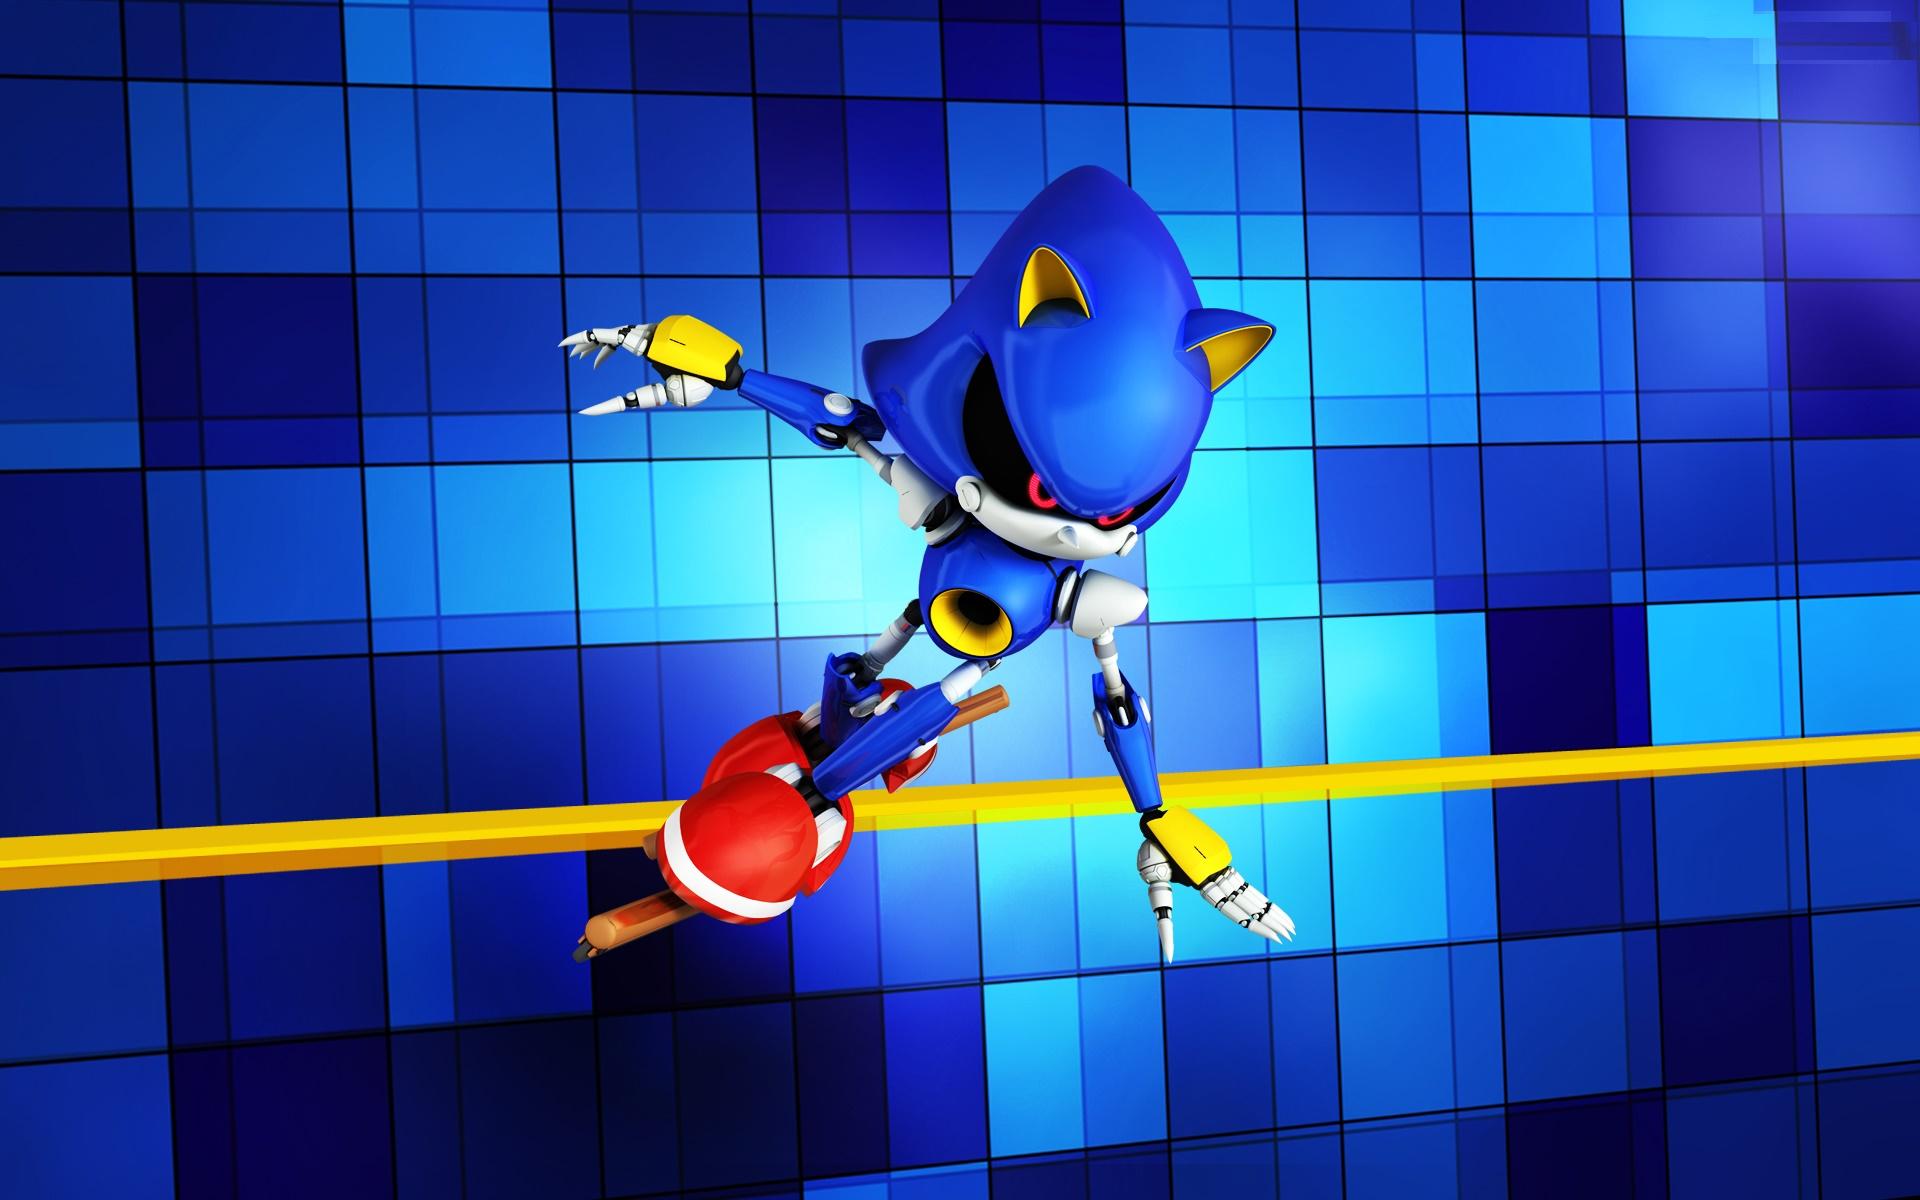 Metal Sonic Hd Wallpaper Pictures 1920x1200 Download Hd Wallpaper Wallpapertip